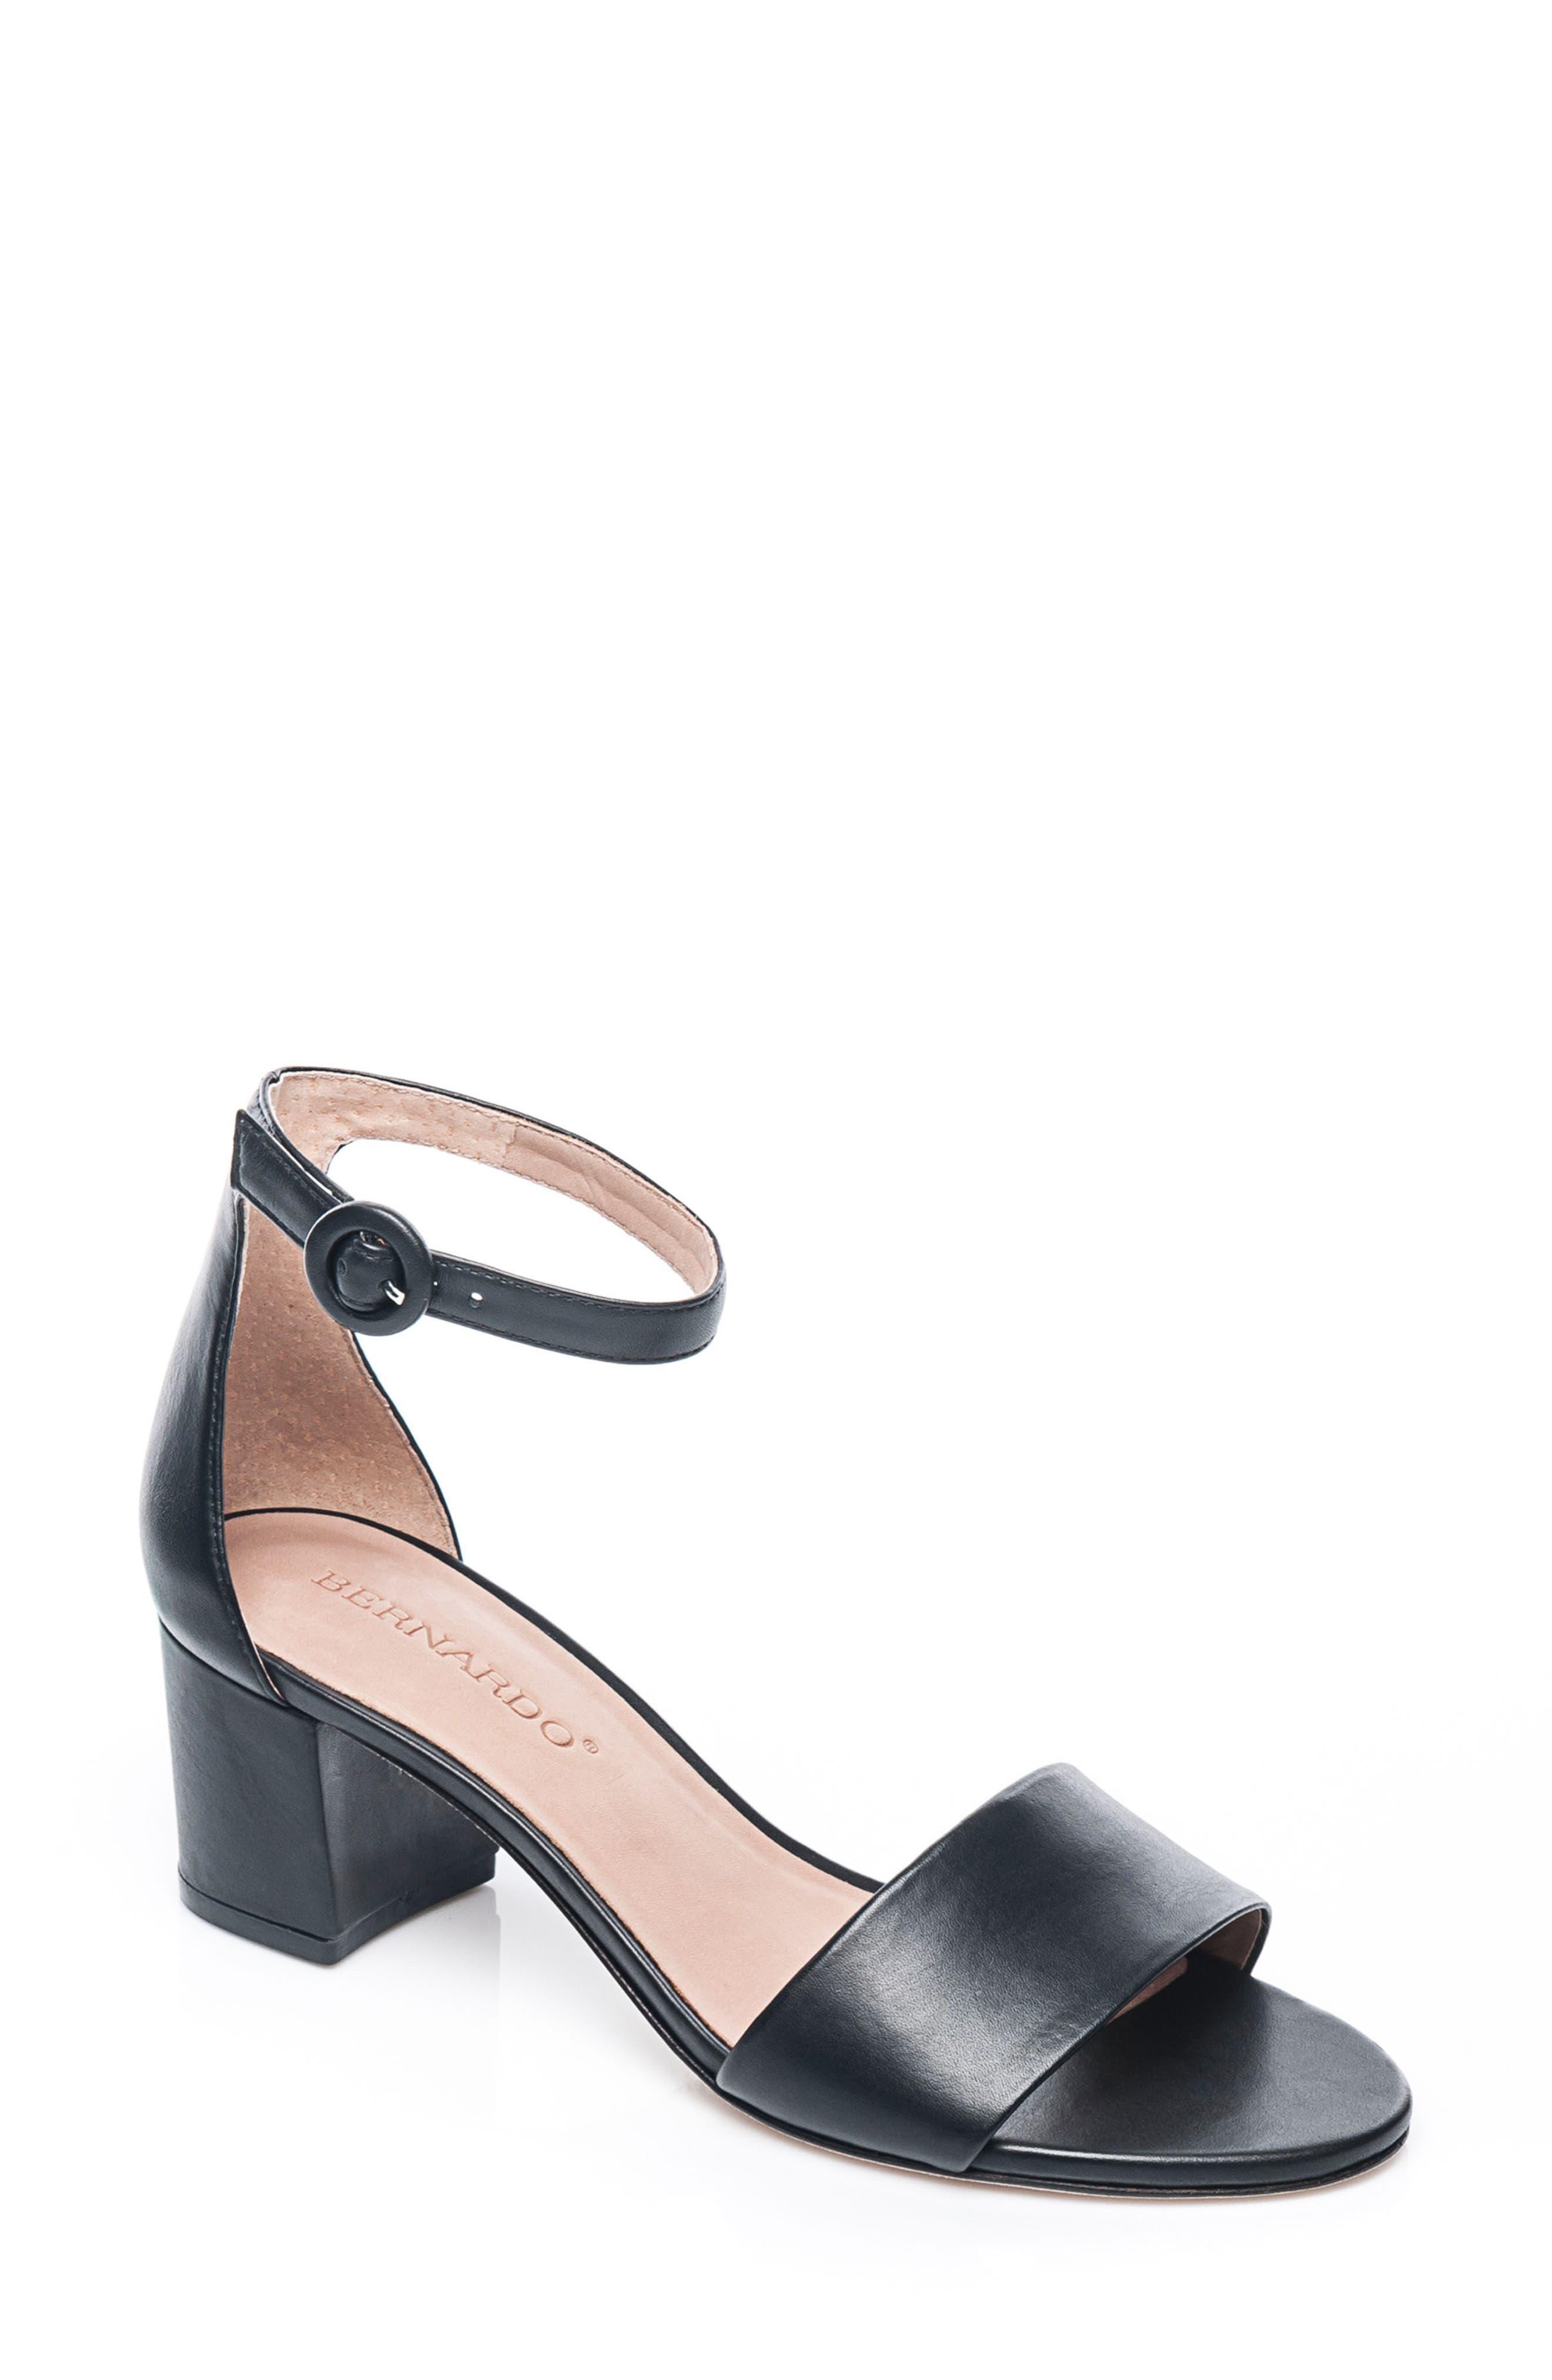 BERNARDO, Belinda Ankle Strap Sandal, Main thumbnail 1, color, BLACK LEATHER